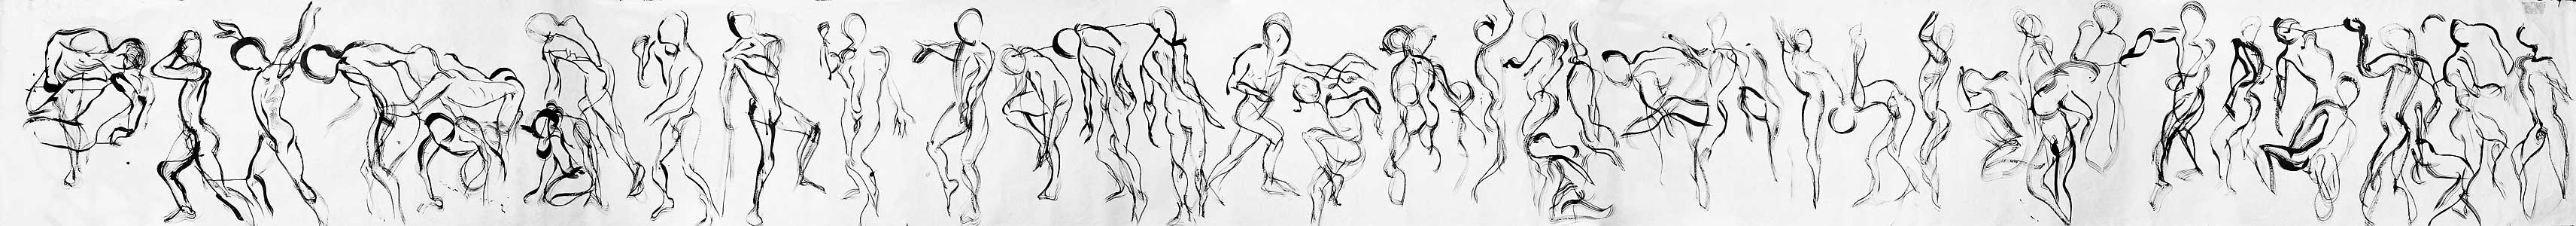 Patrick scroll, 2000, 91 cm x 1006 cm, by Fred Hatt